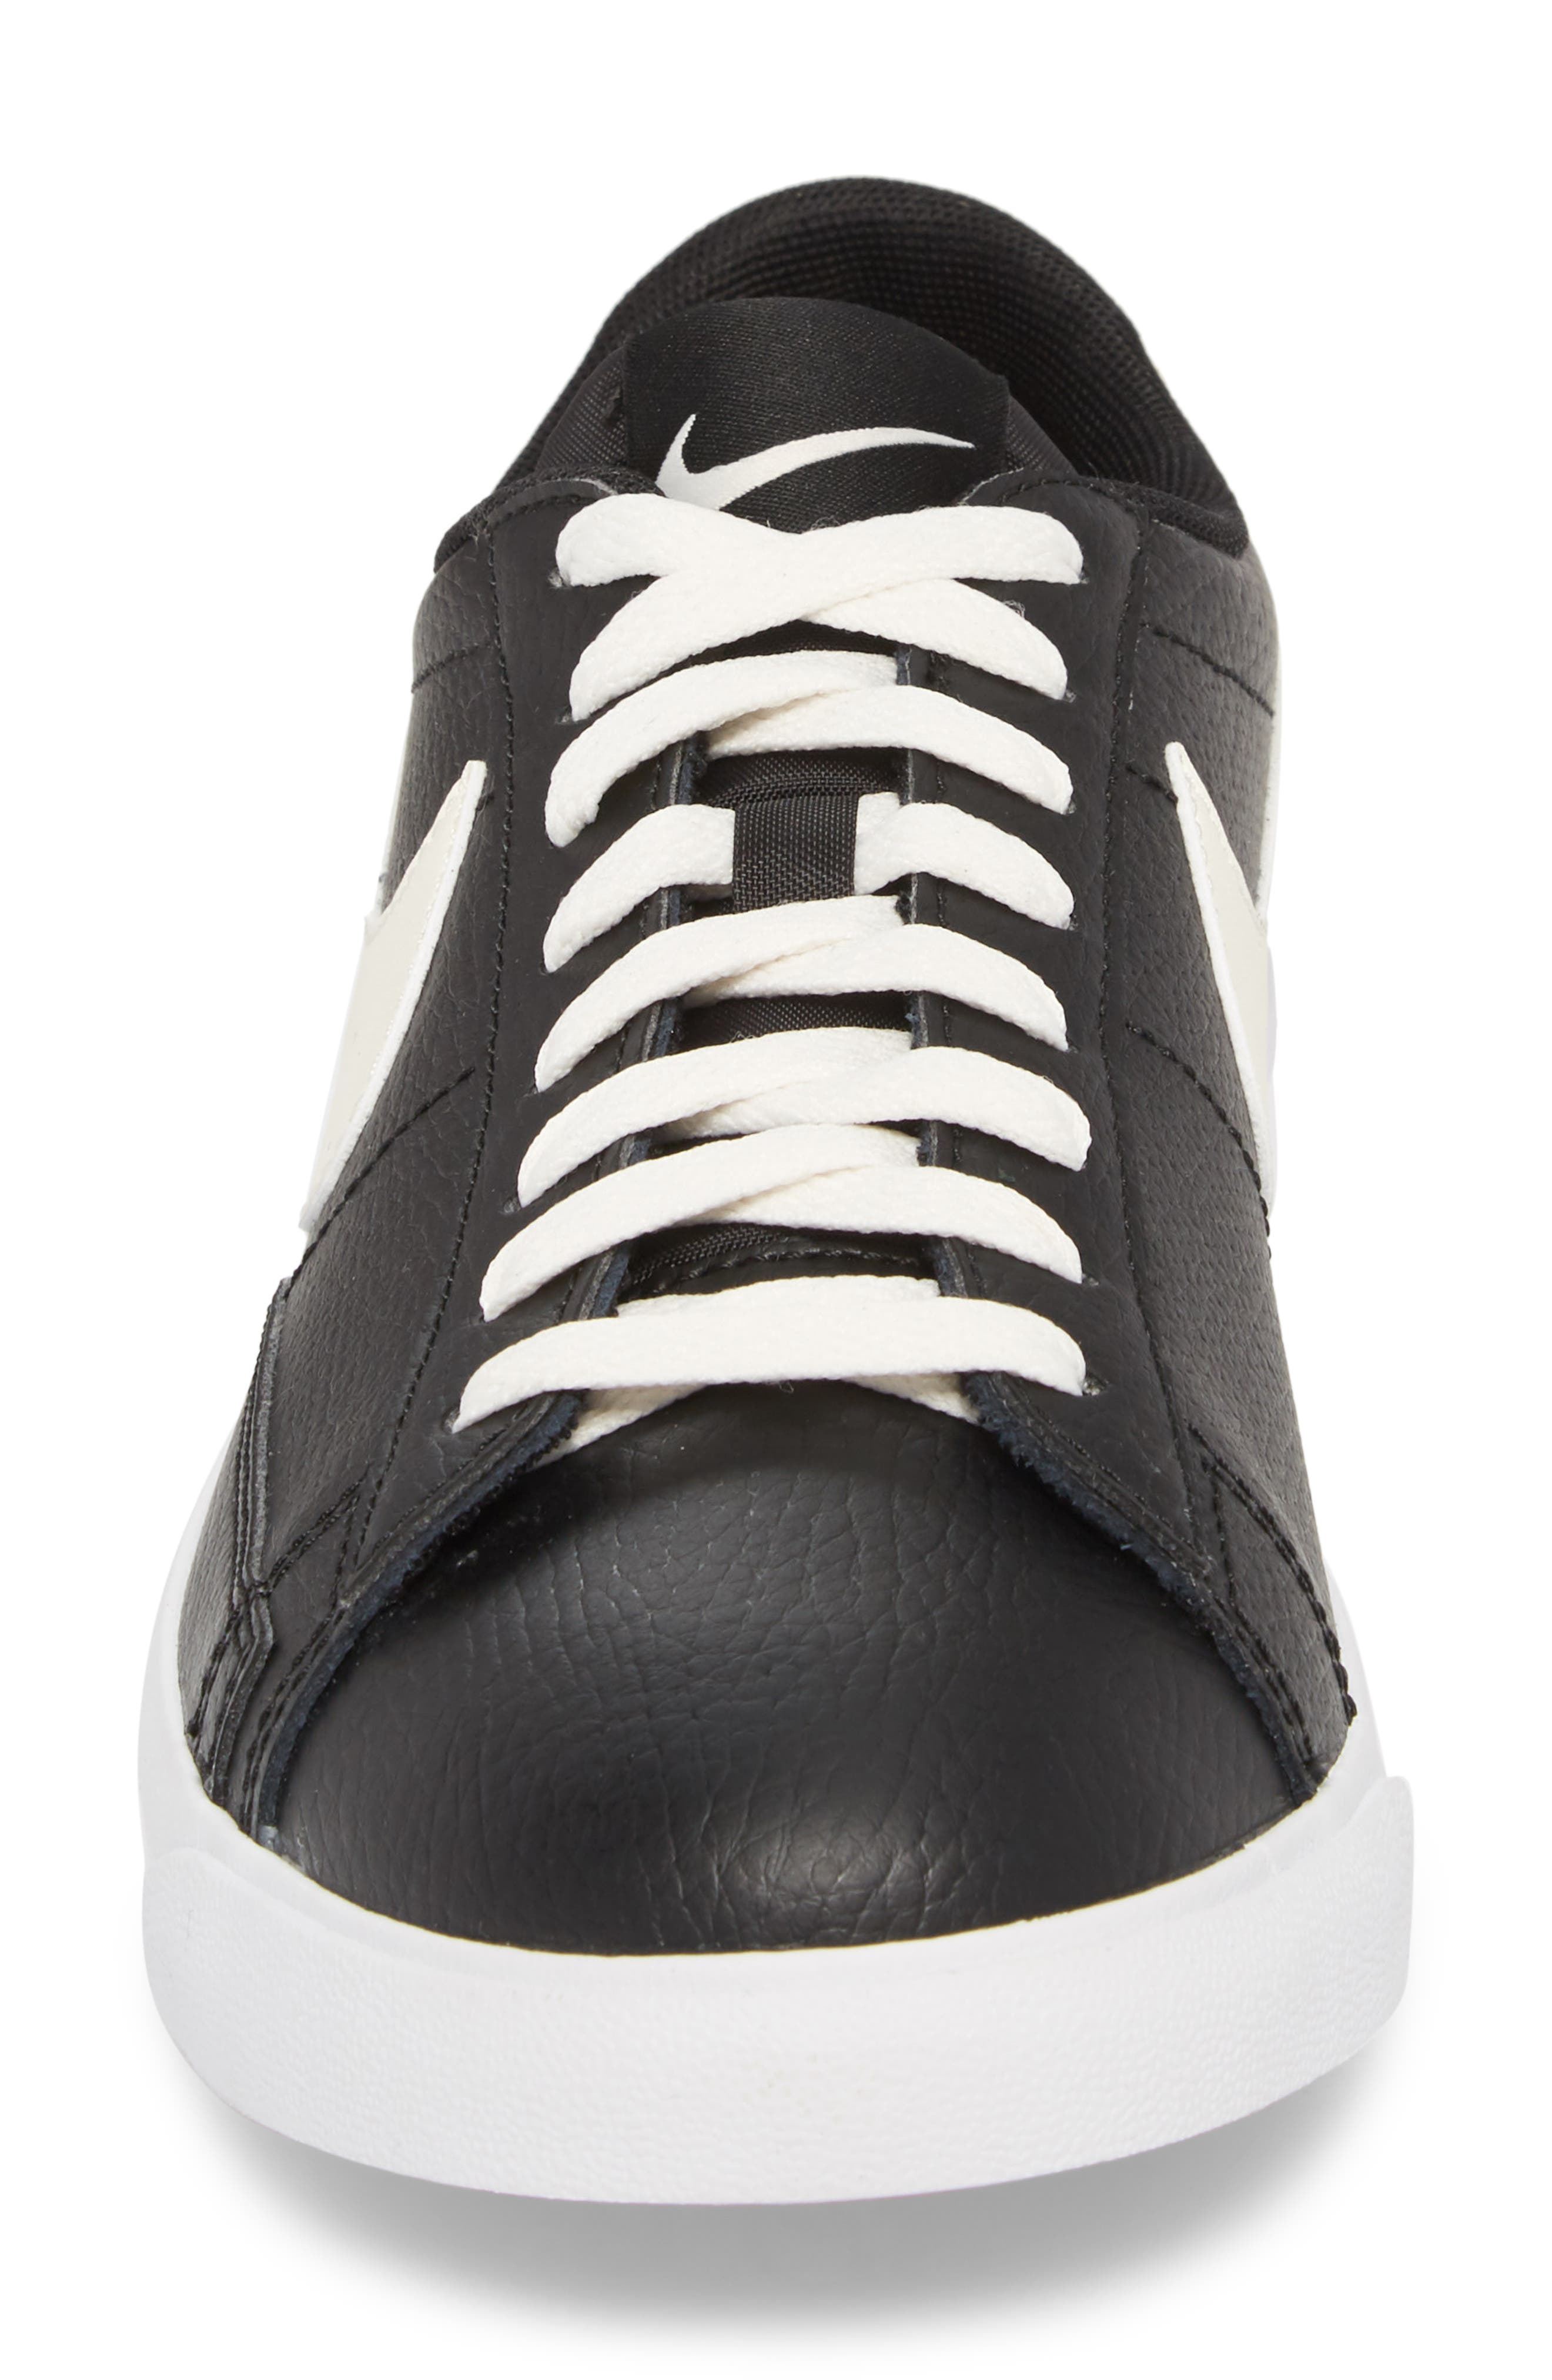 Blazer Low Leather Sneaker,                             Alternate thumbnail 4, color,